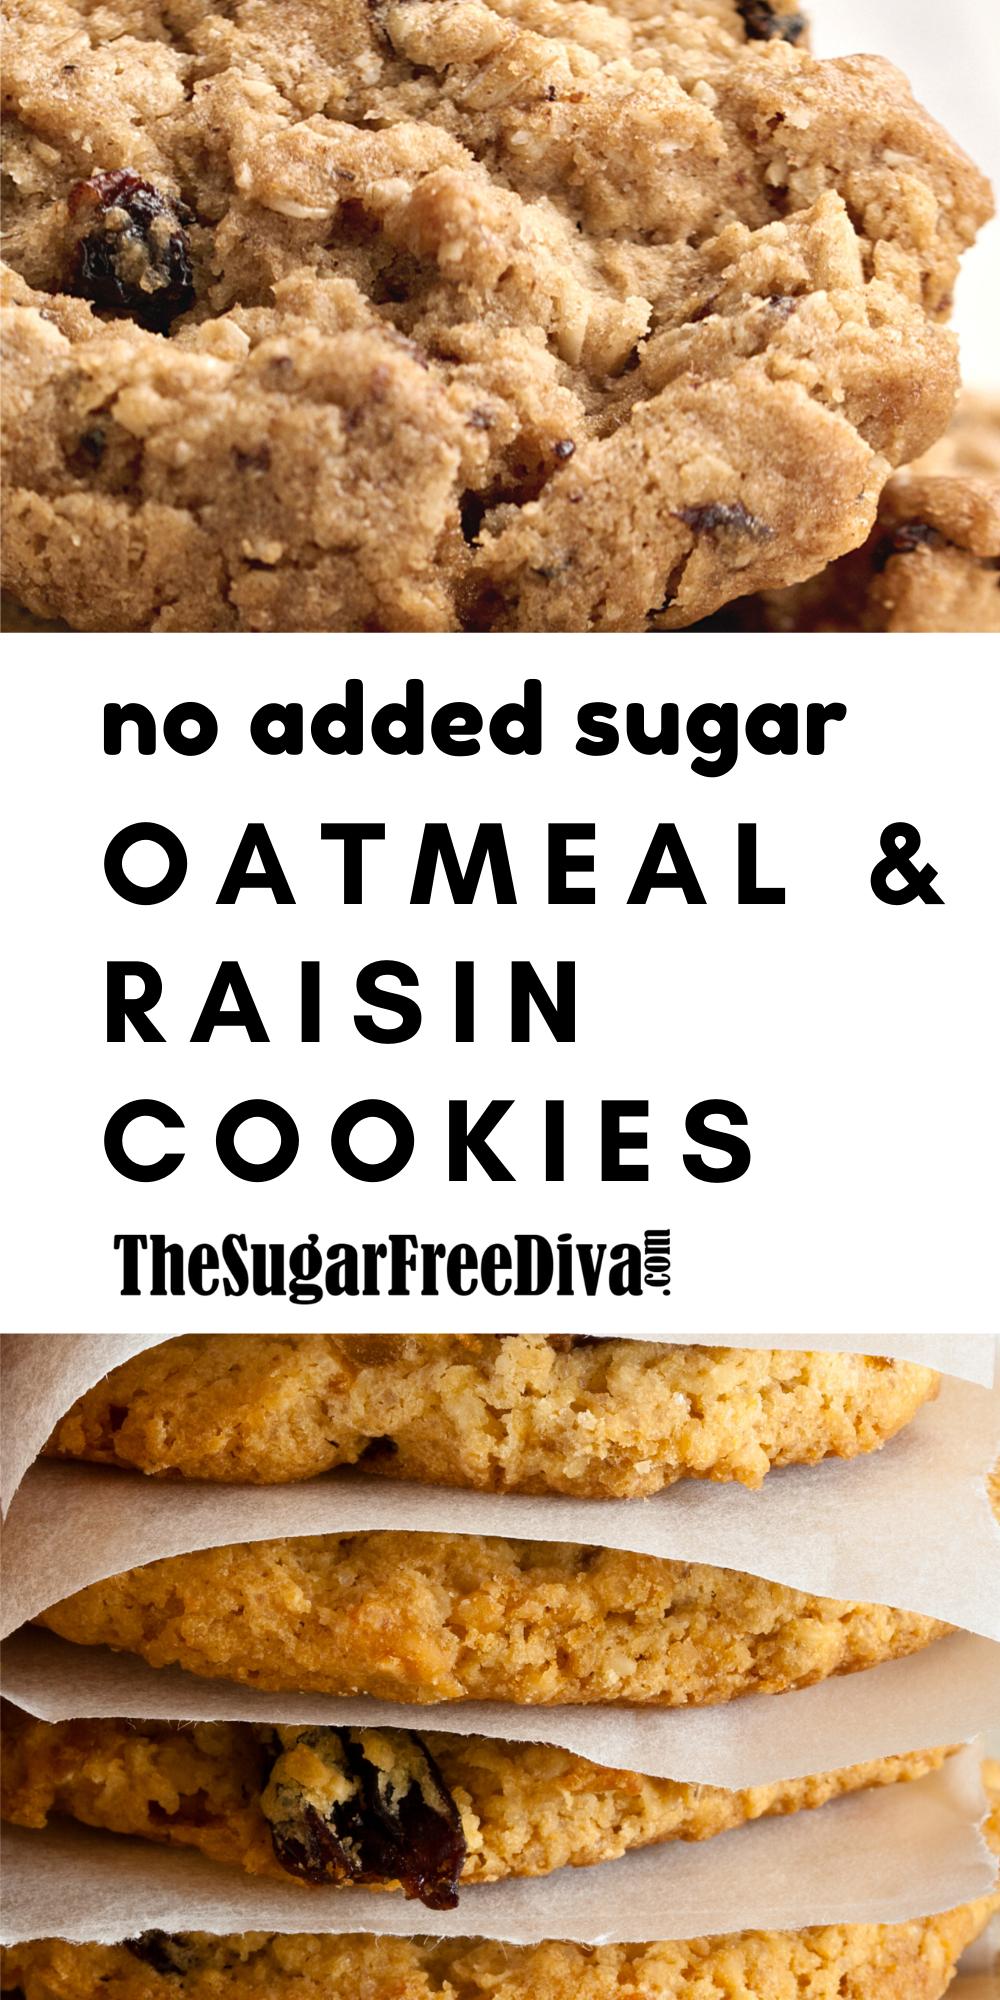 Sugar Free Oatmeal And Raisin Cookies Sugar Free Oatmeal Oatmeal Cookie Recipes Healthy Oatmeal Raisin Cookies